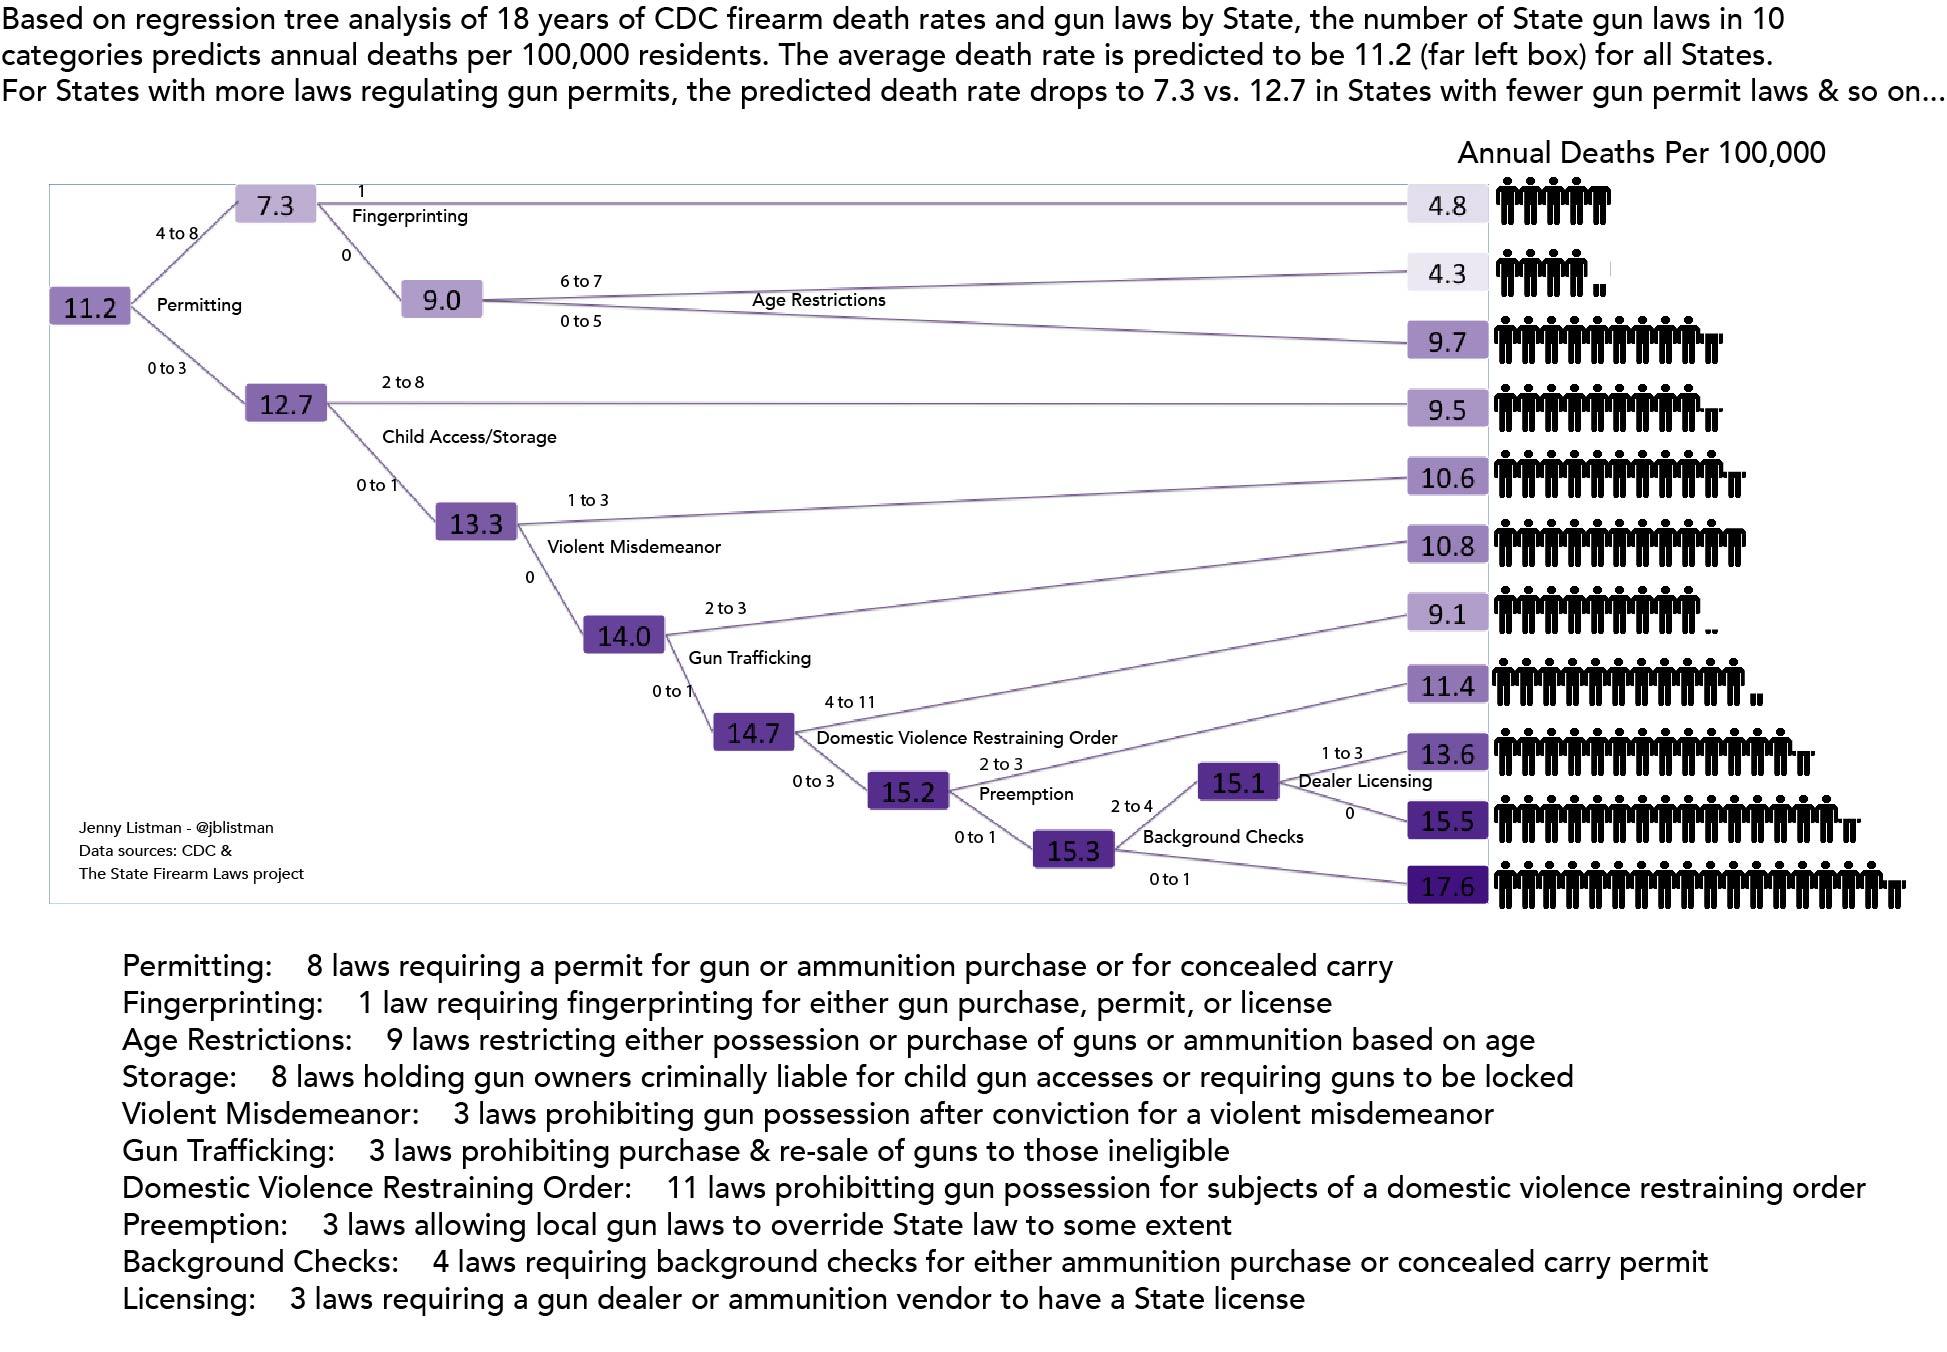 Gun Deaths and Gun Laws: Recursive Partitioning and